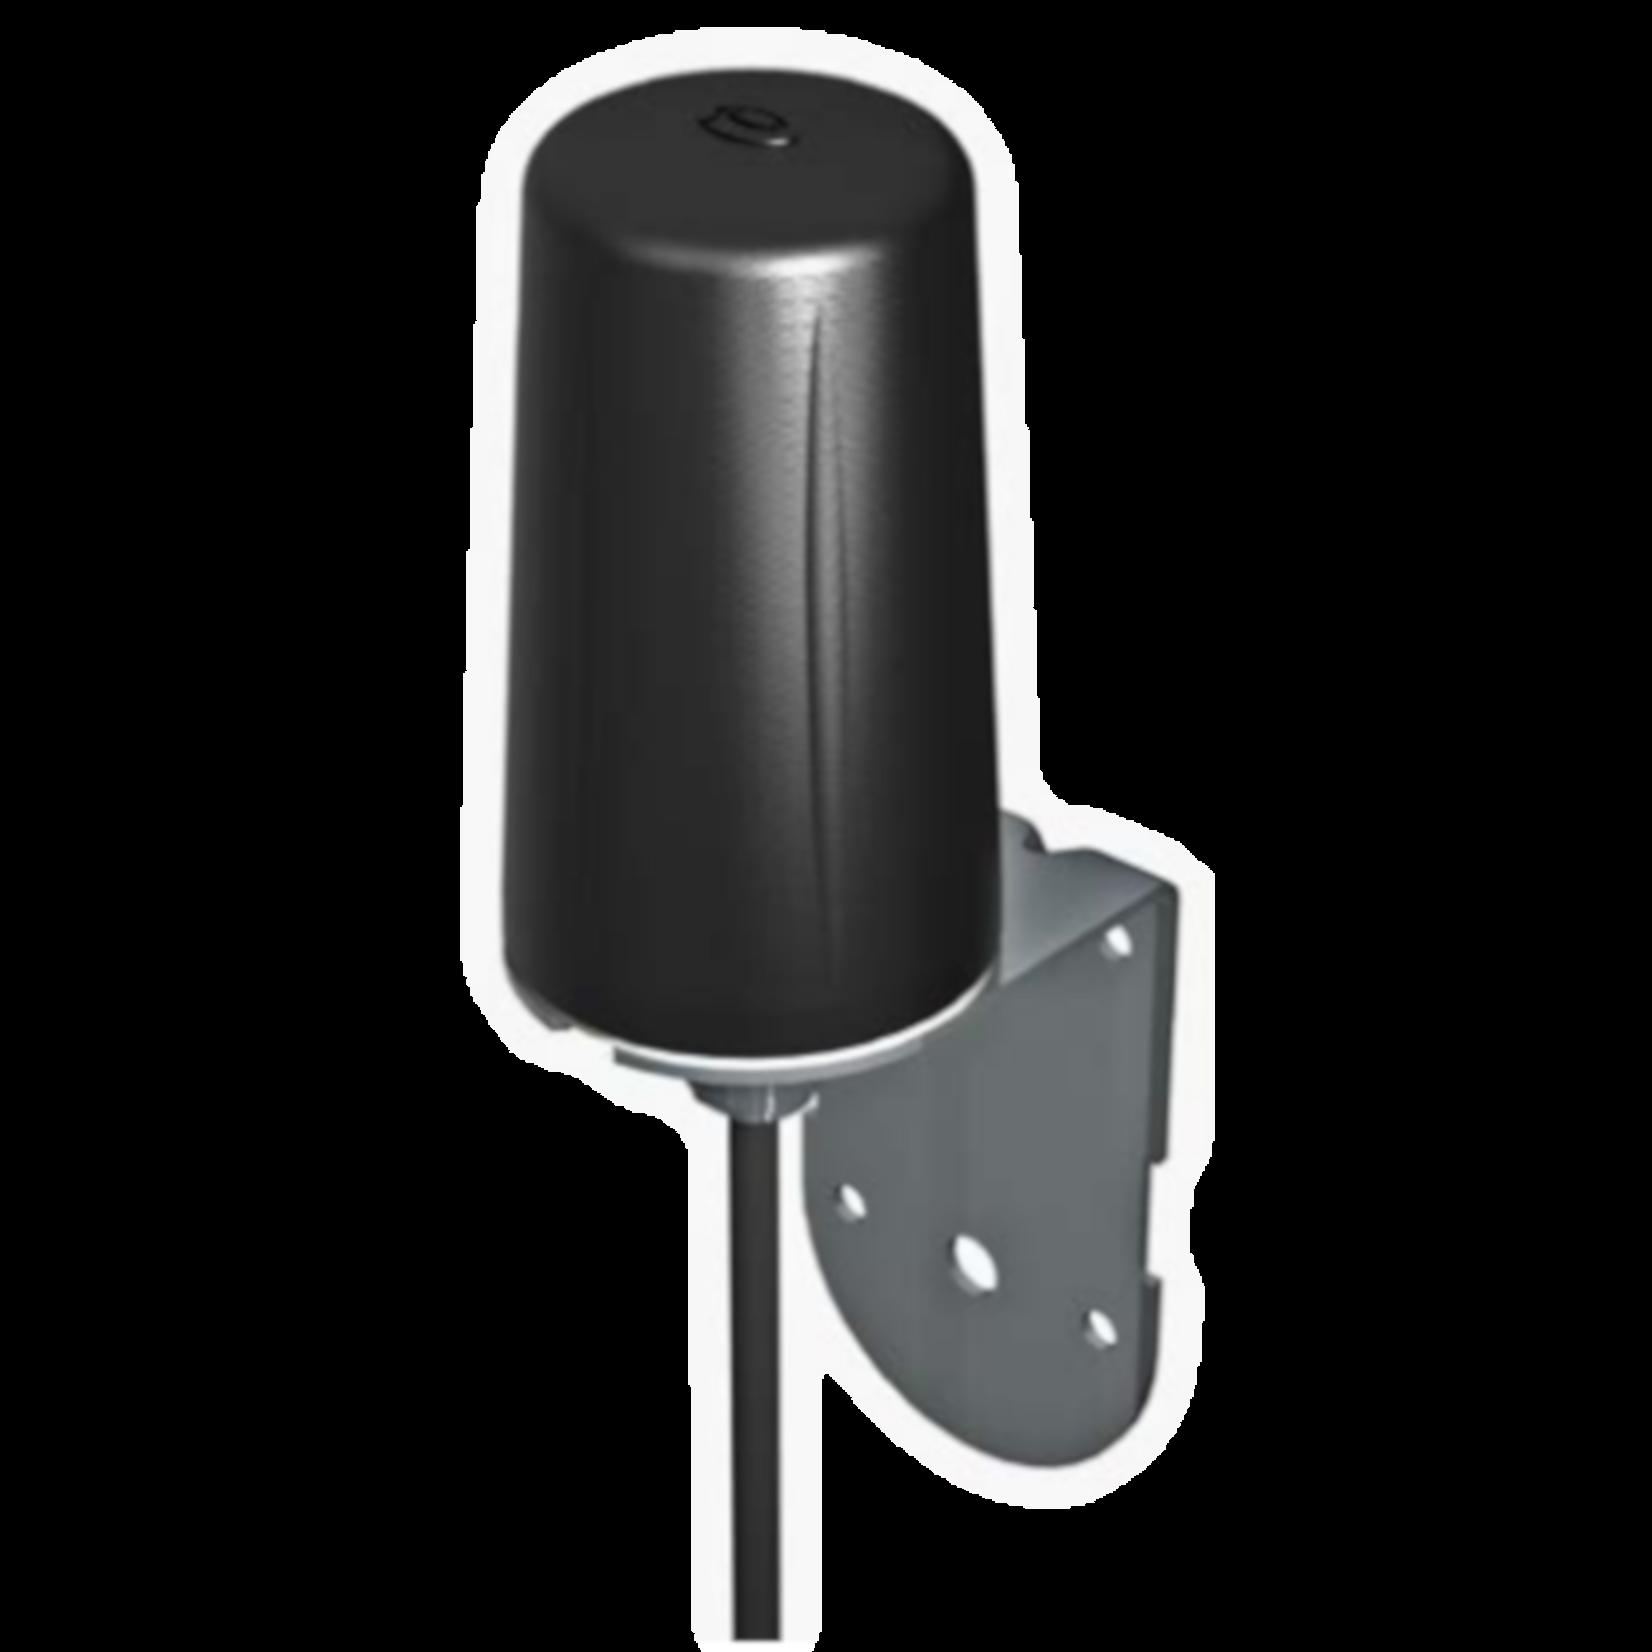 Boly Cellular Camera Antenna